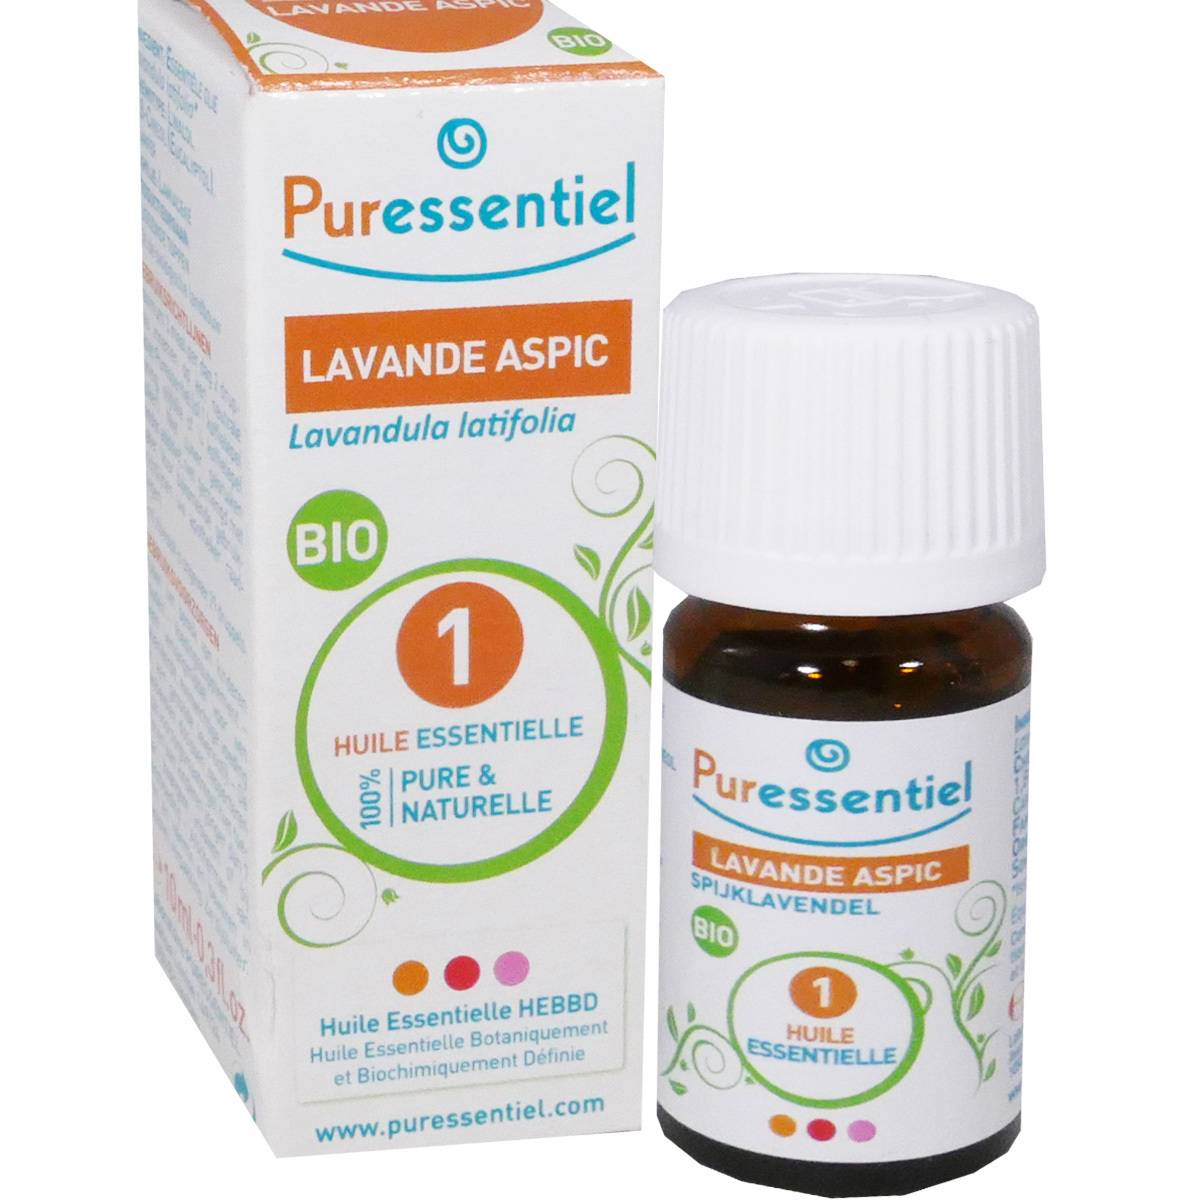 Puressentiel huile essentielle lavande aspic 10 ml